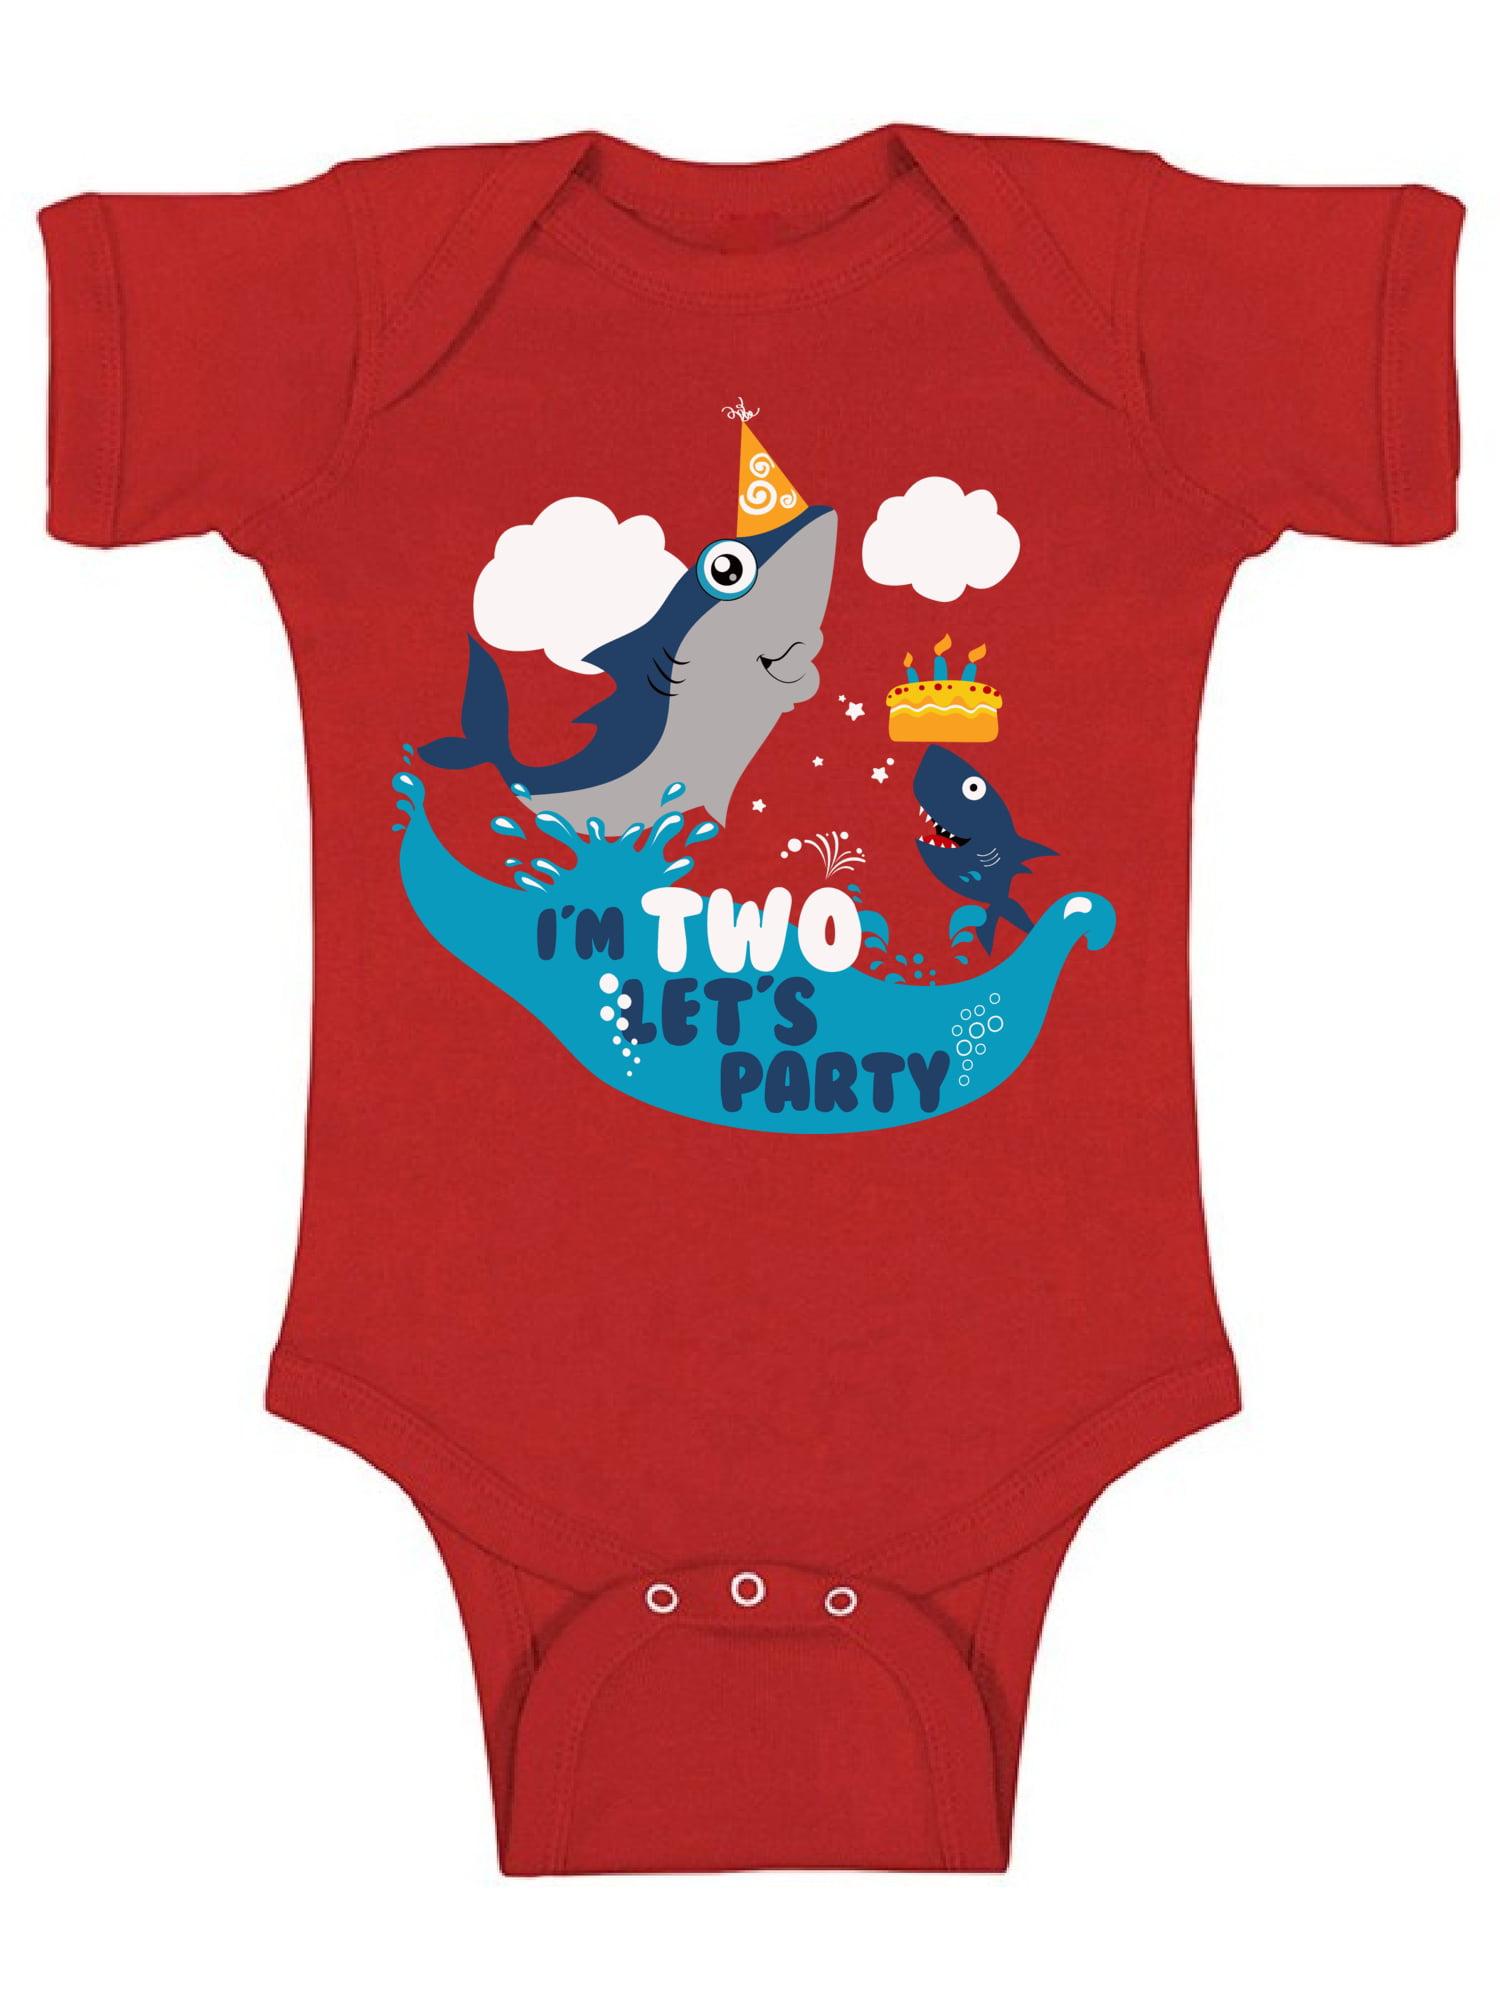 f18be8df1 Awkward Styles Shark Birthday Bodysuit Short Sleeve for Newborn Baby Shark  Birthday Gifts for 2 Year Old Cute One Piece Shark Outfit 2nd Birthday  Bodysuit ...